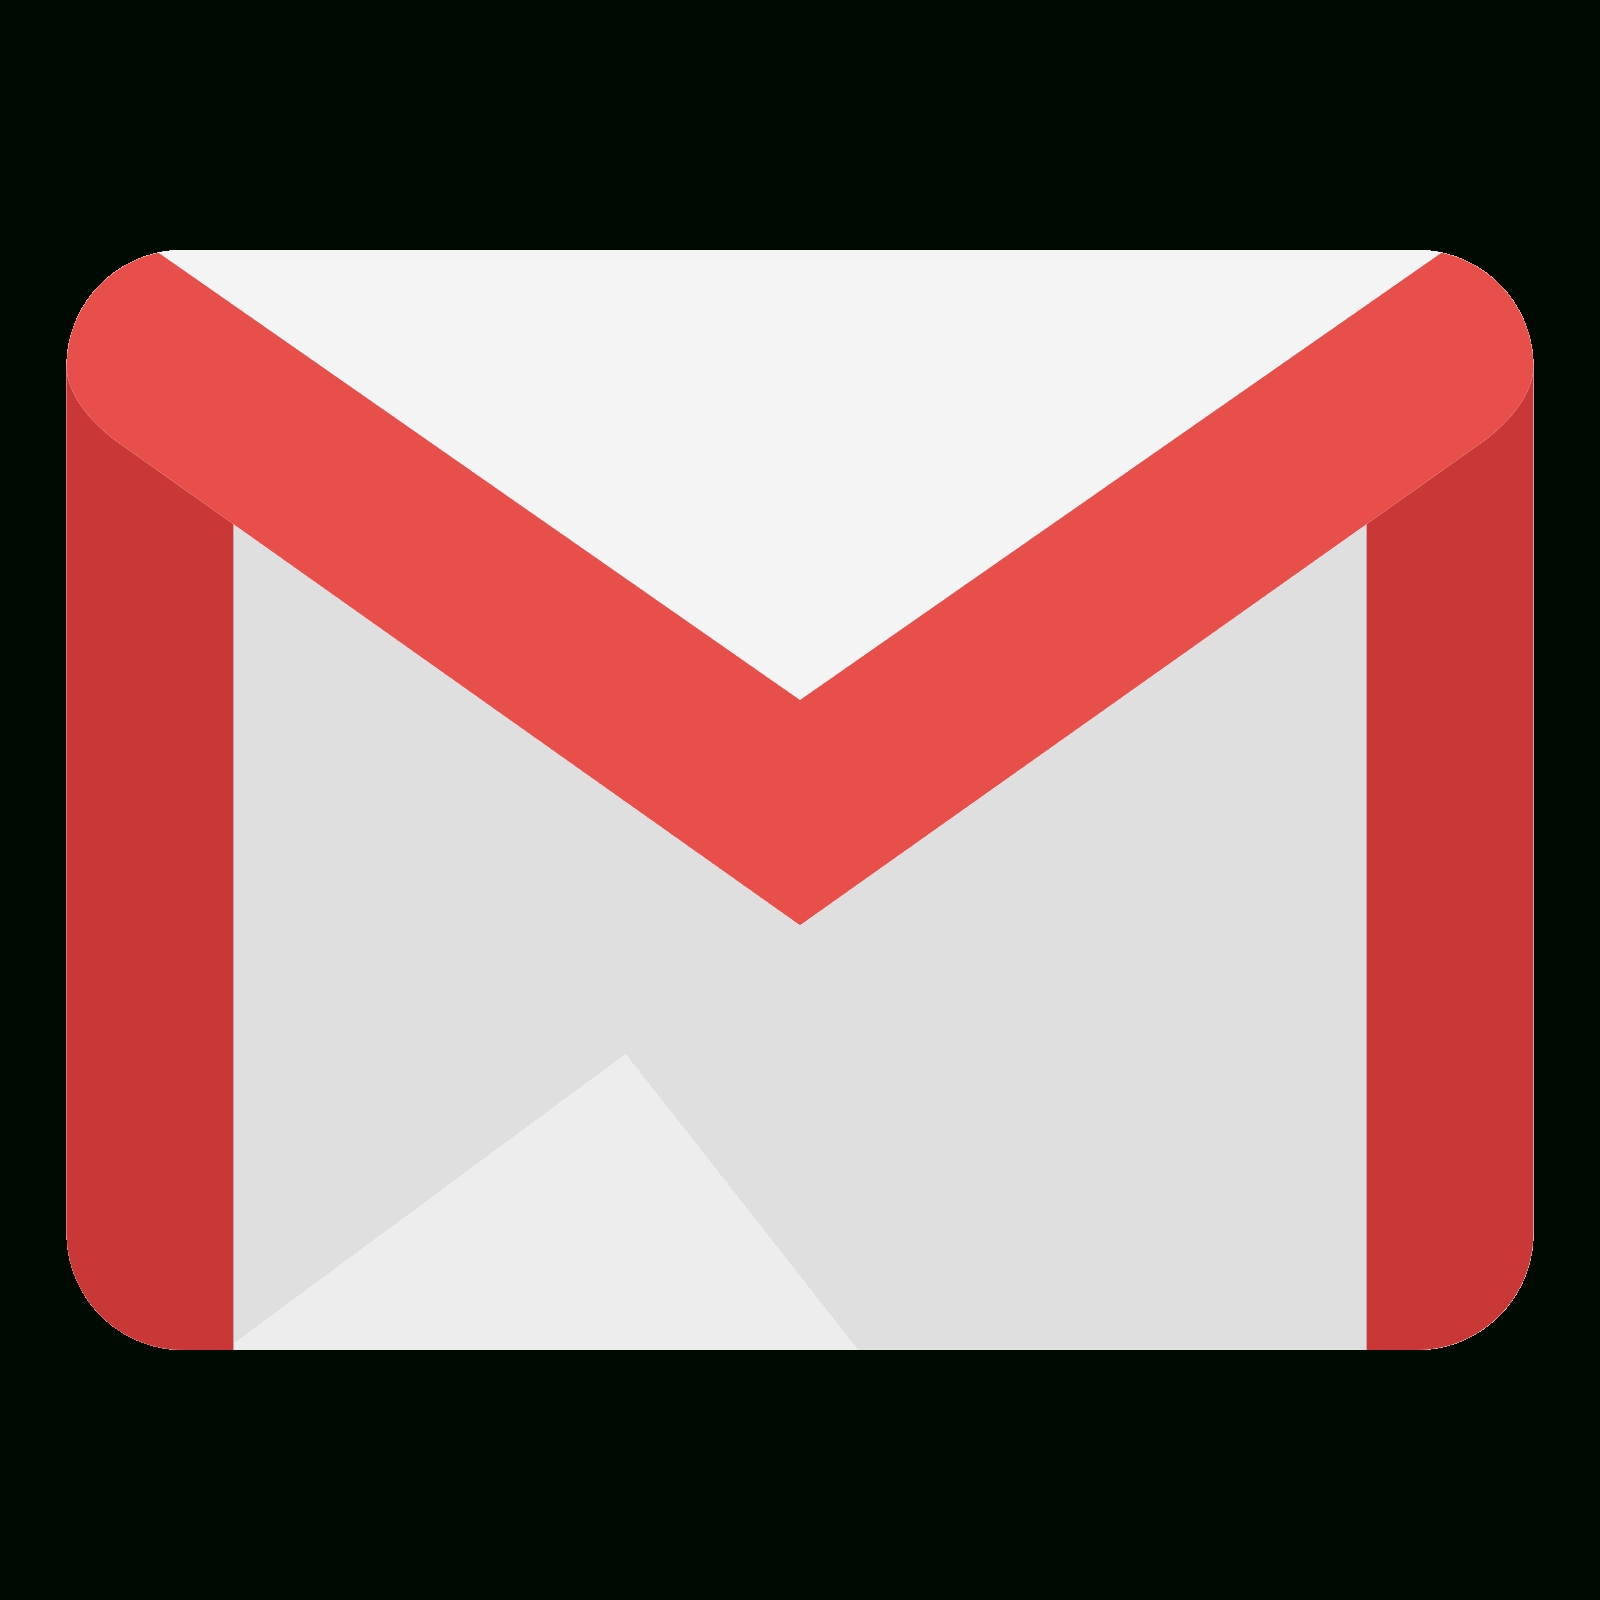 Gmail Logo Transparent Background.